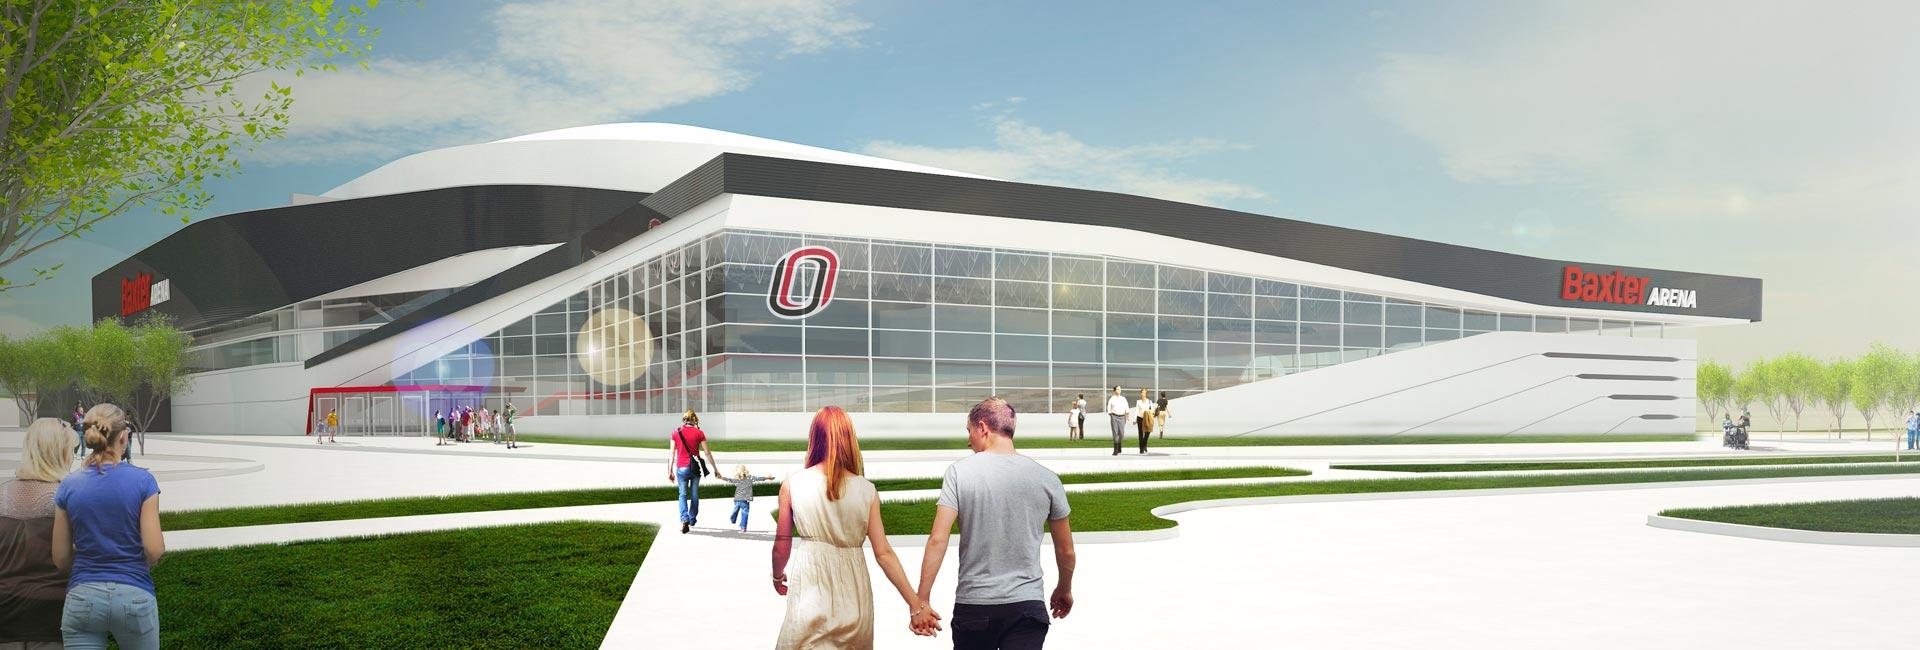 Baxter Auto Omaha >> Welcome to Baxter Arena | News | University of Nebraska Omaha